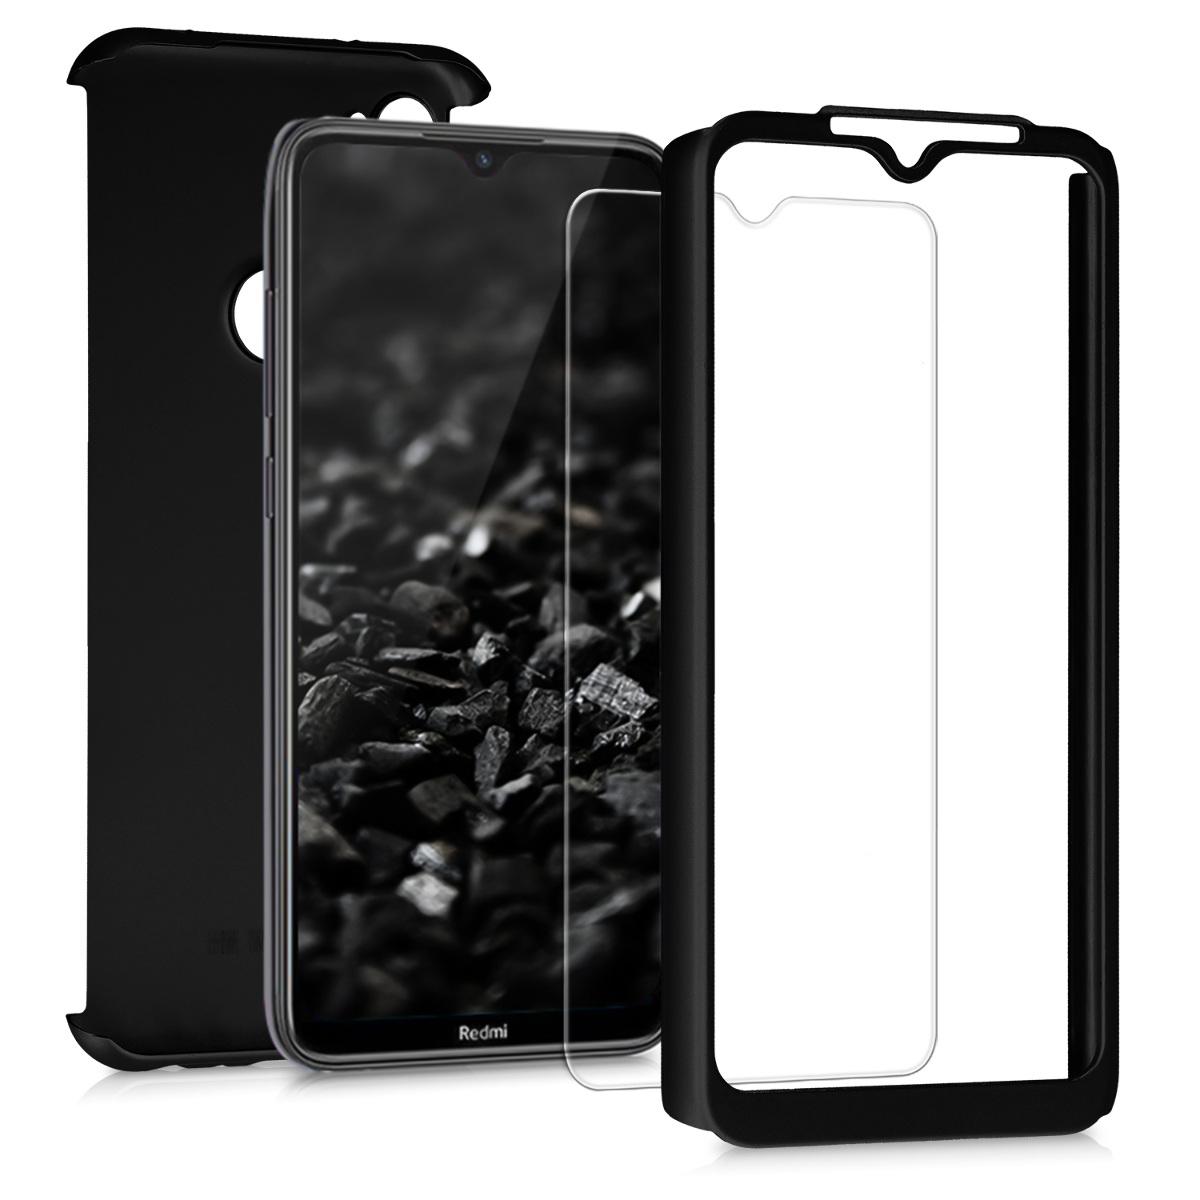 KW Θήκη Full Body Xiaomi Redmi Note 8T & Tempered Glass - Metallic Black (50989.68)